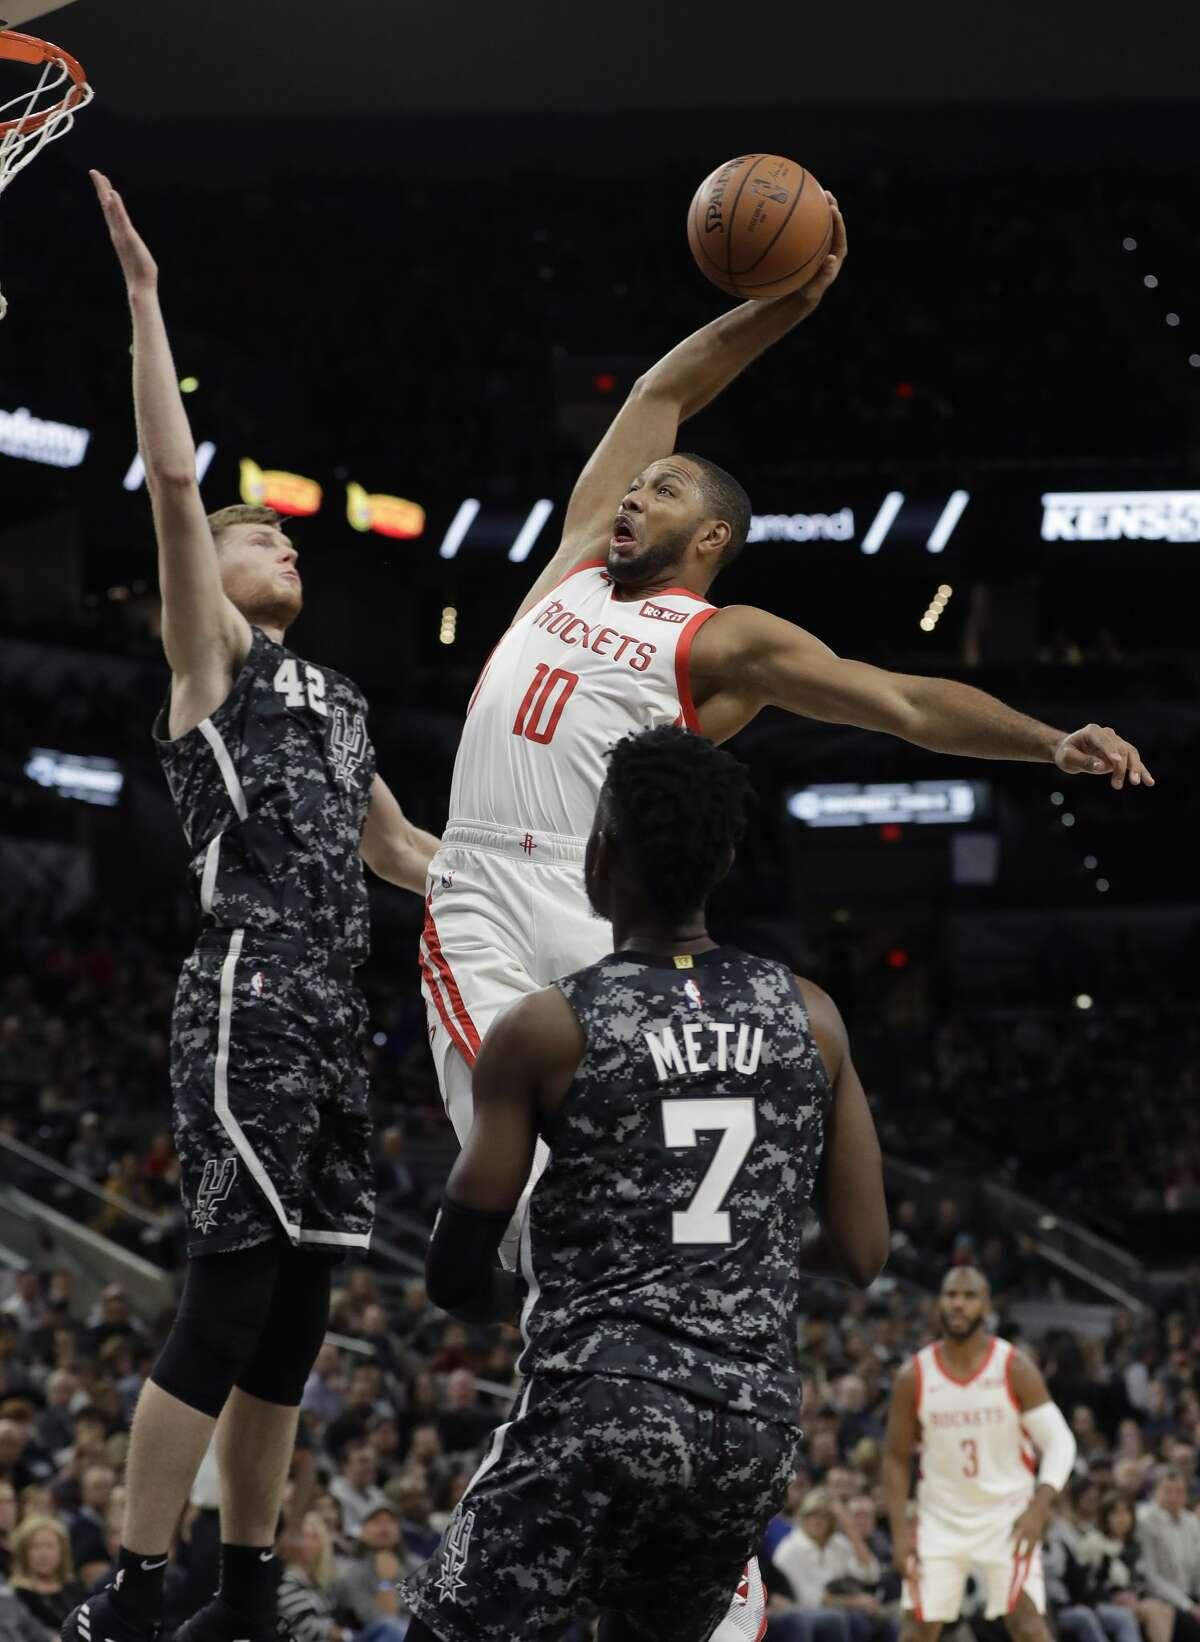 Houston Rockets guard Eric Gordon (10) scores over San Antonio Spurs forward Davis Bertans (42) during the first half of an NBA basketball game, Saturday, Nov. 10, 2018, in San Antonio. (AP Photo/Eric Gay)